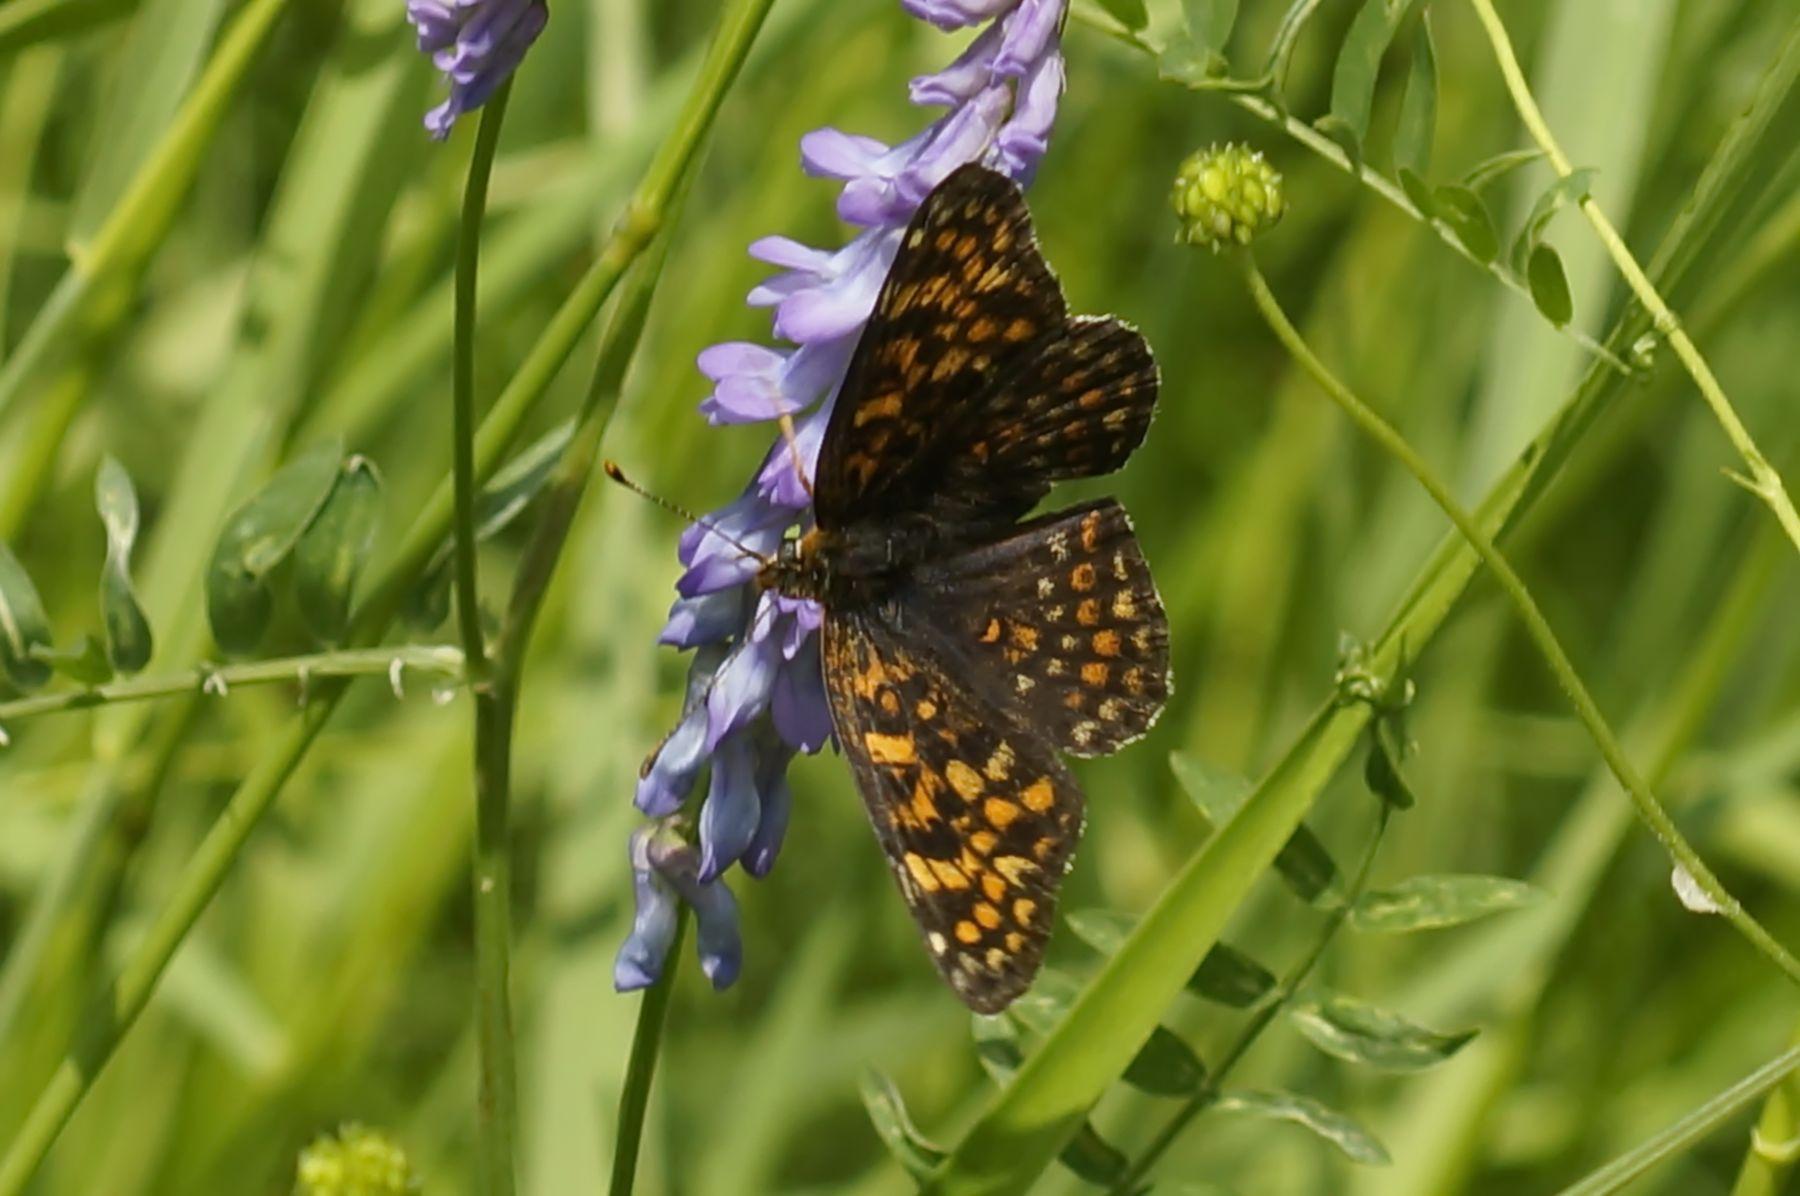 Шашечница шашечница бабочка цветы лес лето